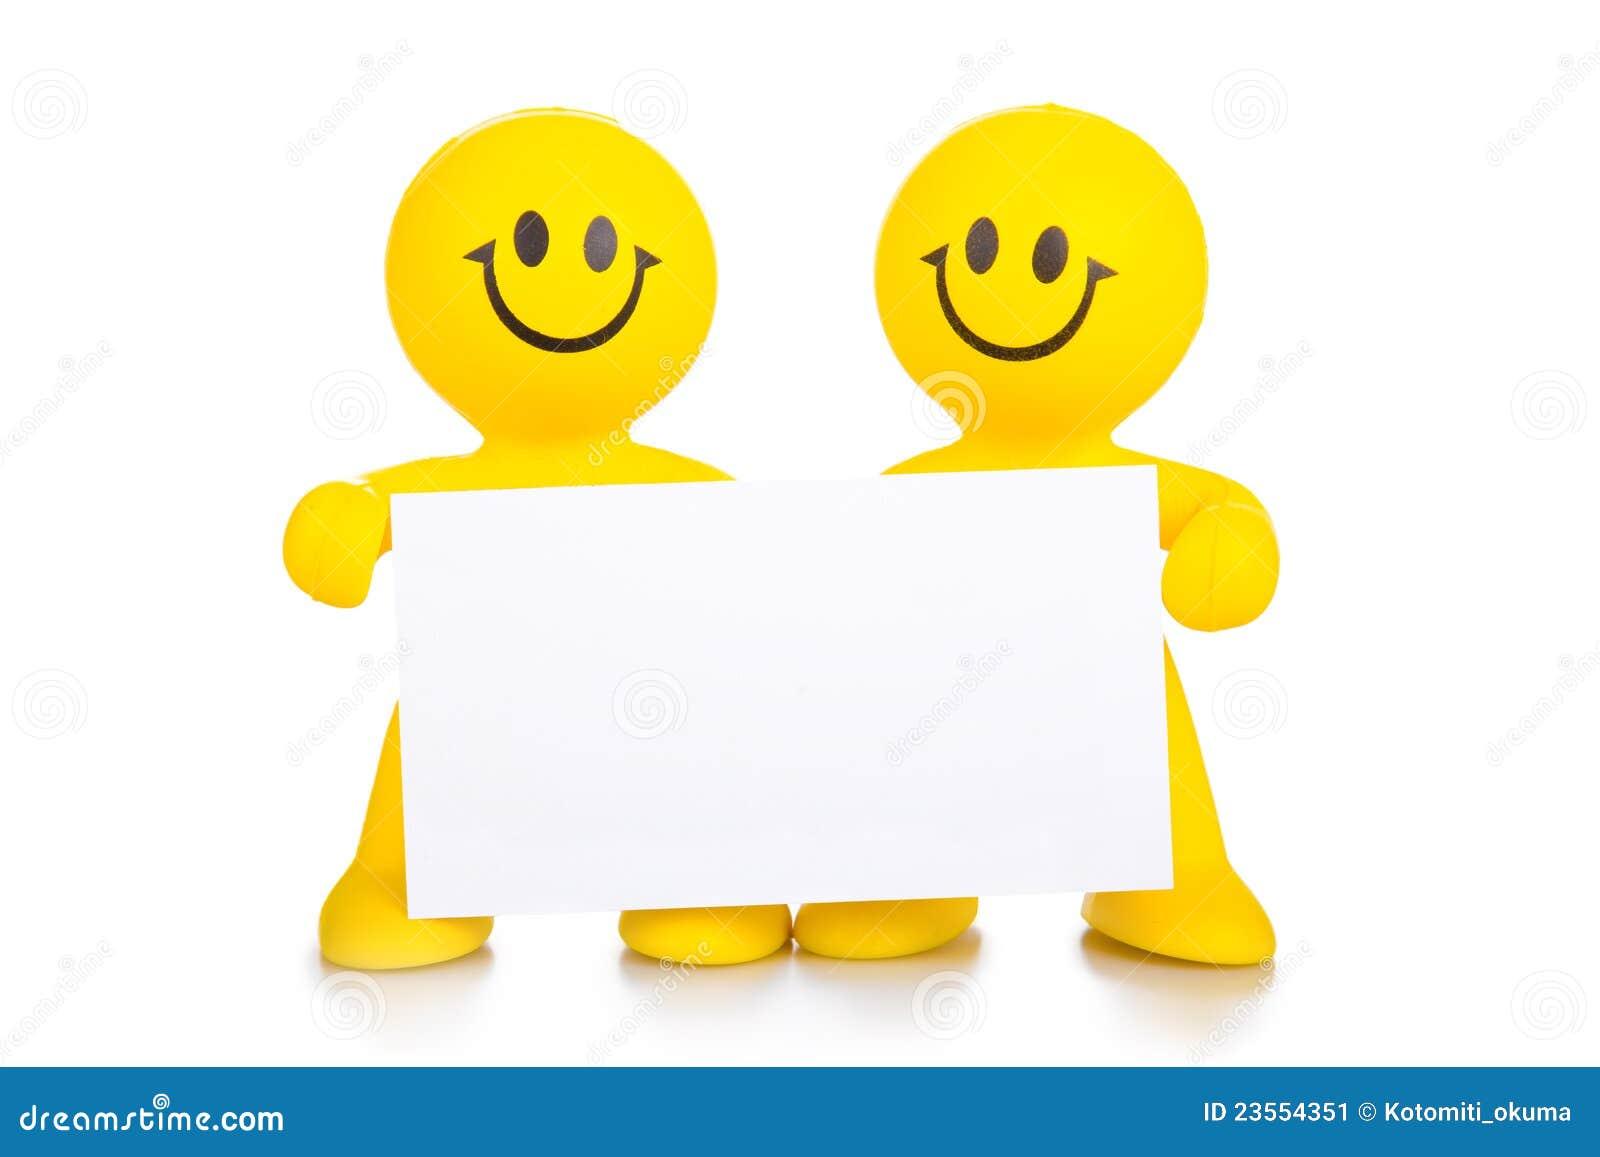 zwei personen halten das reine wei e plakat an stockbild bild 23554351. Black Bedroom Furniture Sets. Home Design Ideas